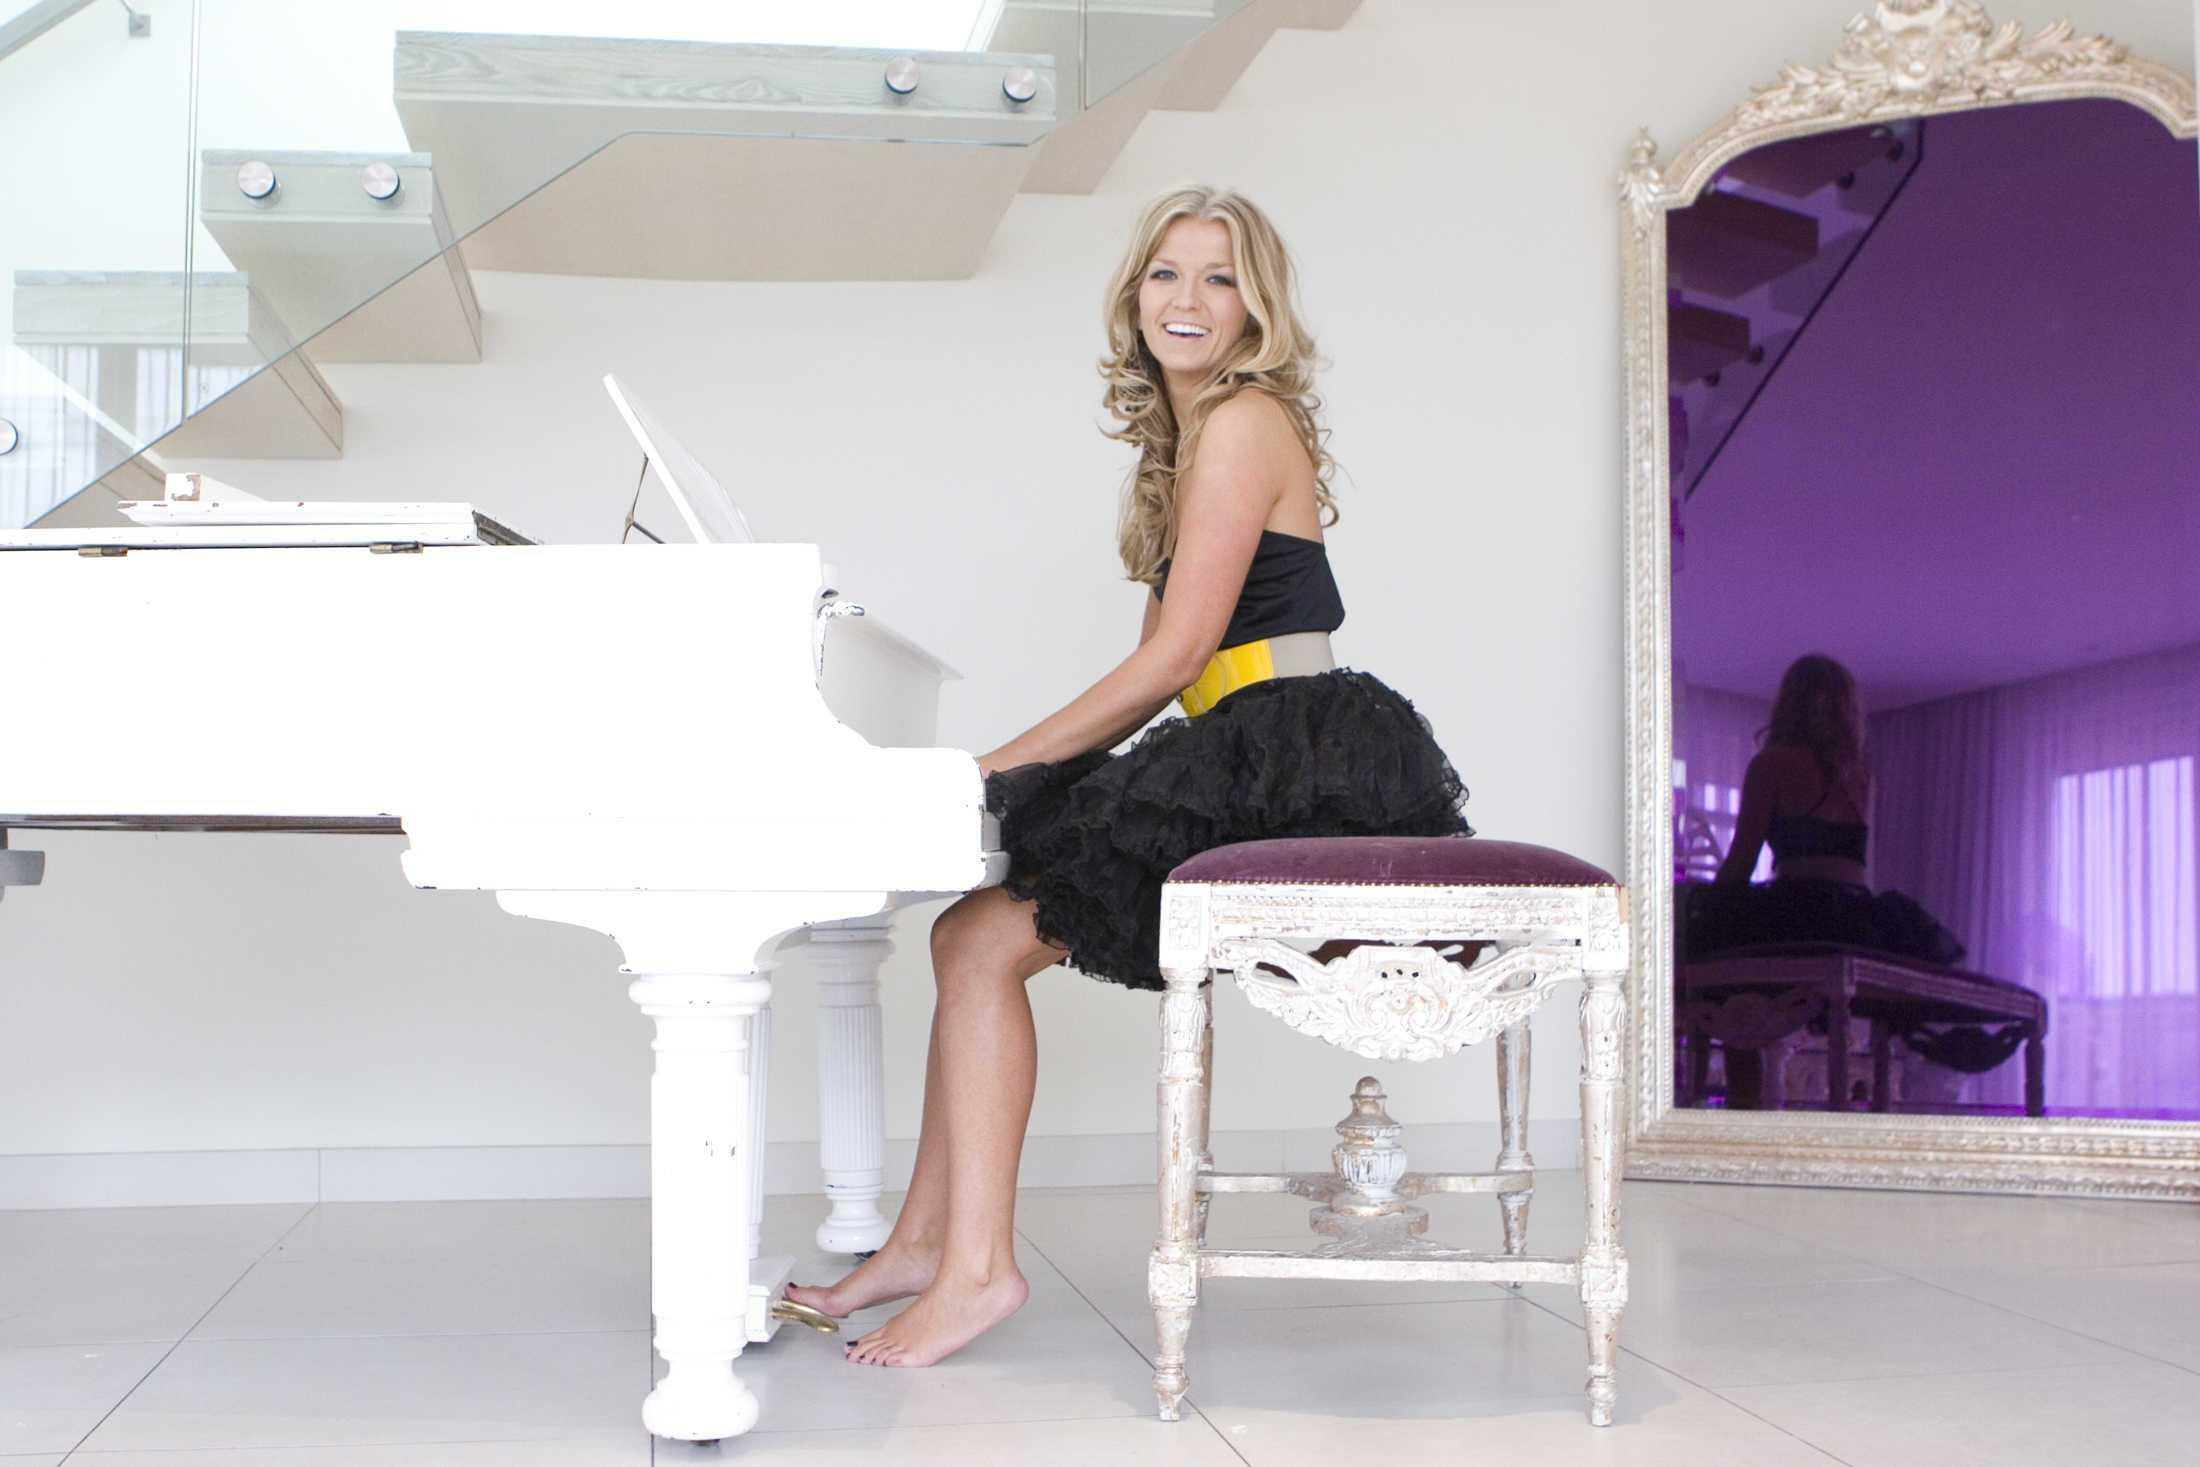 Lush pop from Irish singer-songwriter Roberta Howett, 'Broken Wings' single due March 27th, The Non-Modern Man   Unfashionablemale